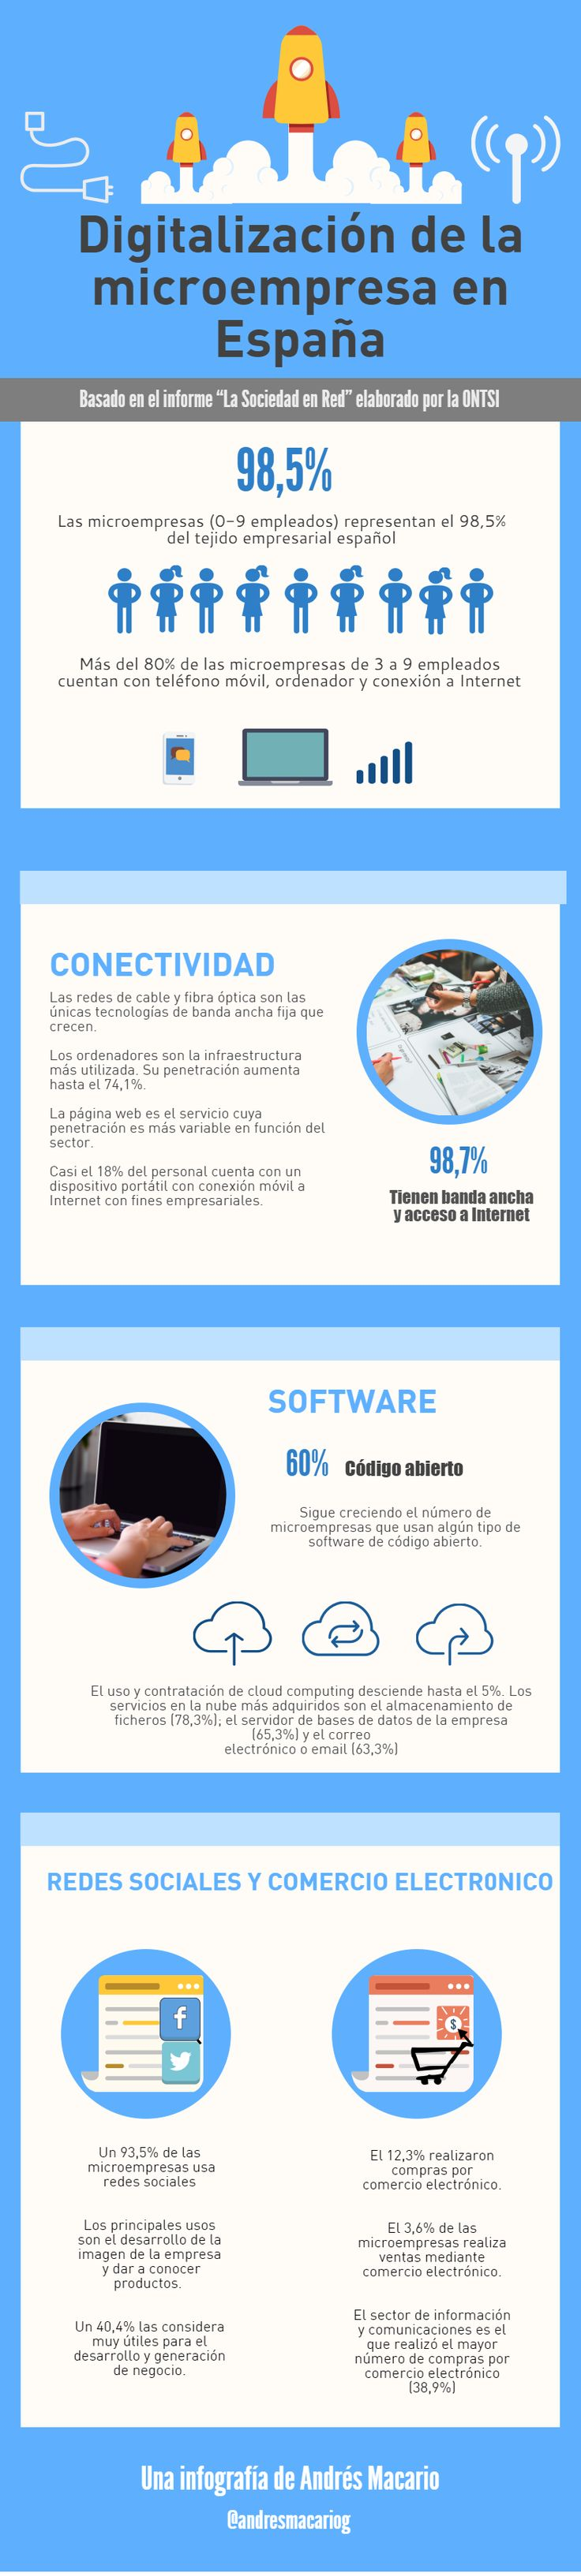 Digitalización de la microempresa en España #infografia